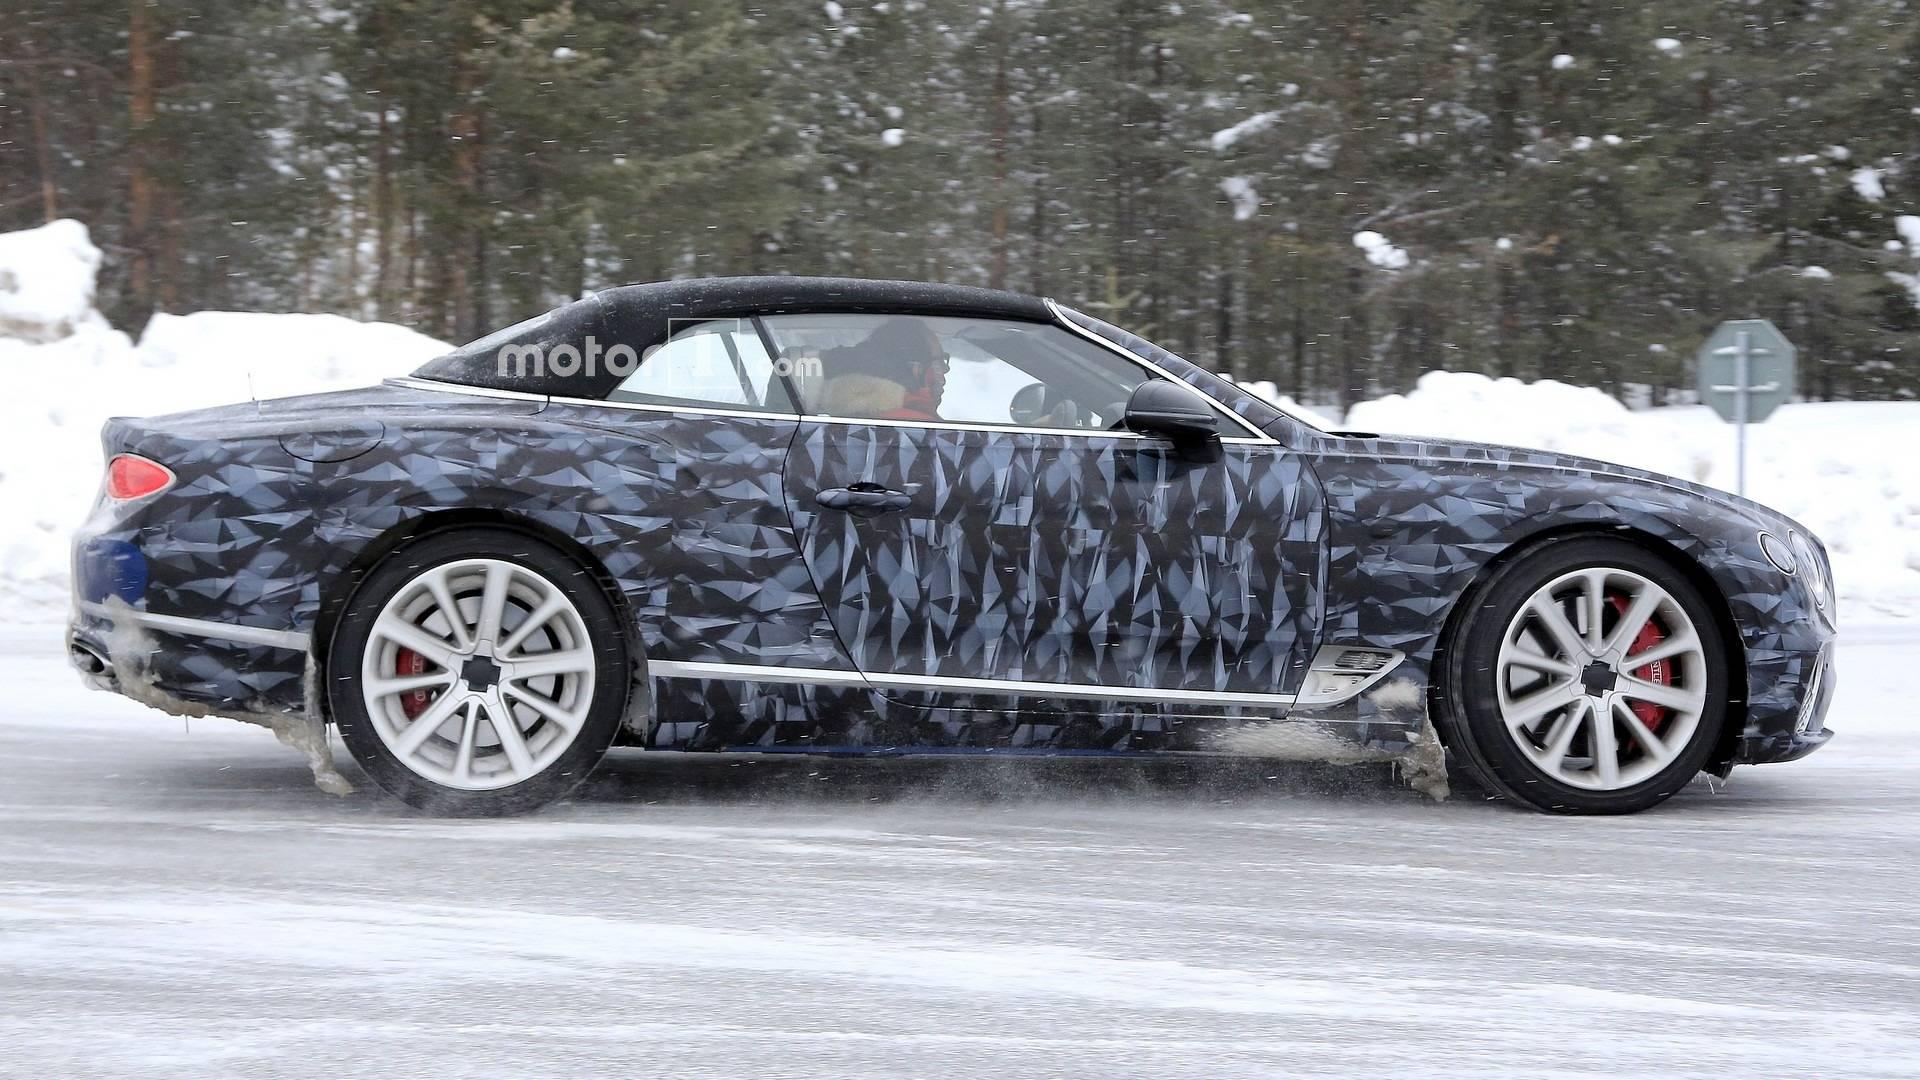 2019 Bentley Continental Gtc Puts On Arctic Wrap Update